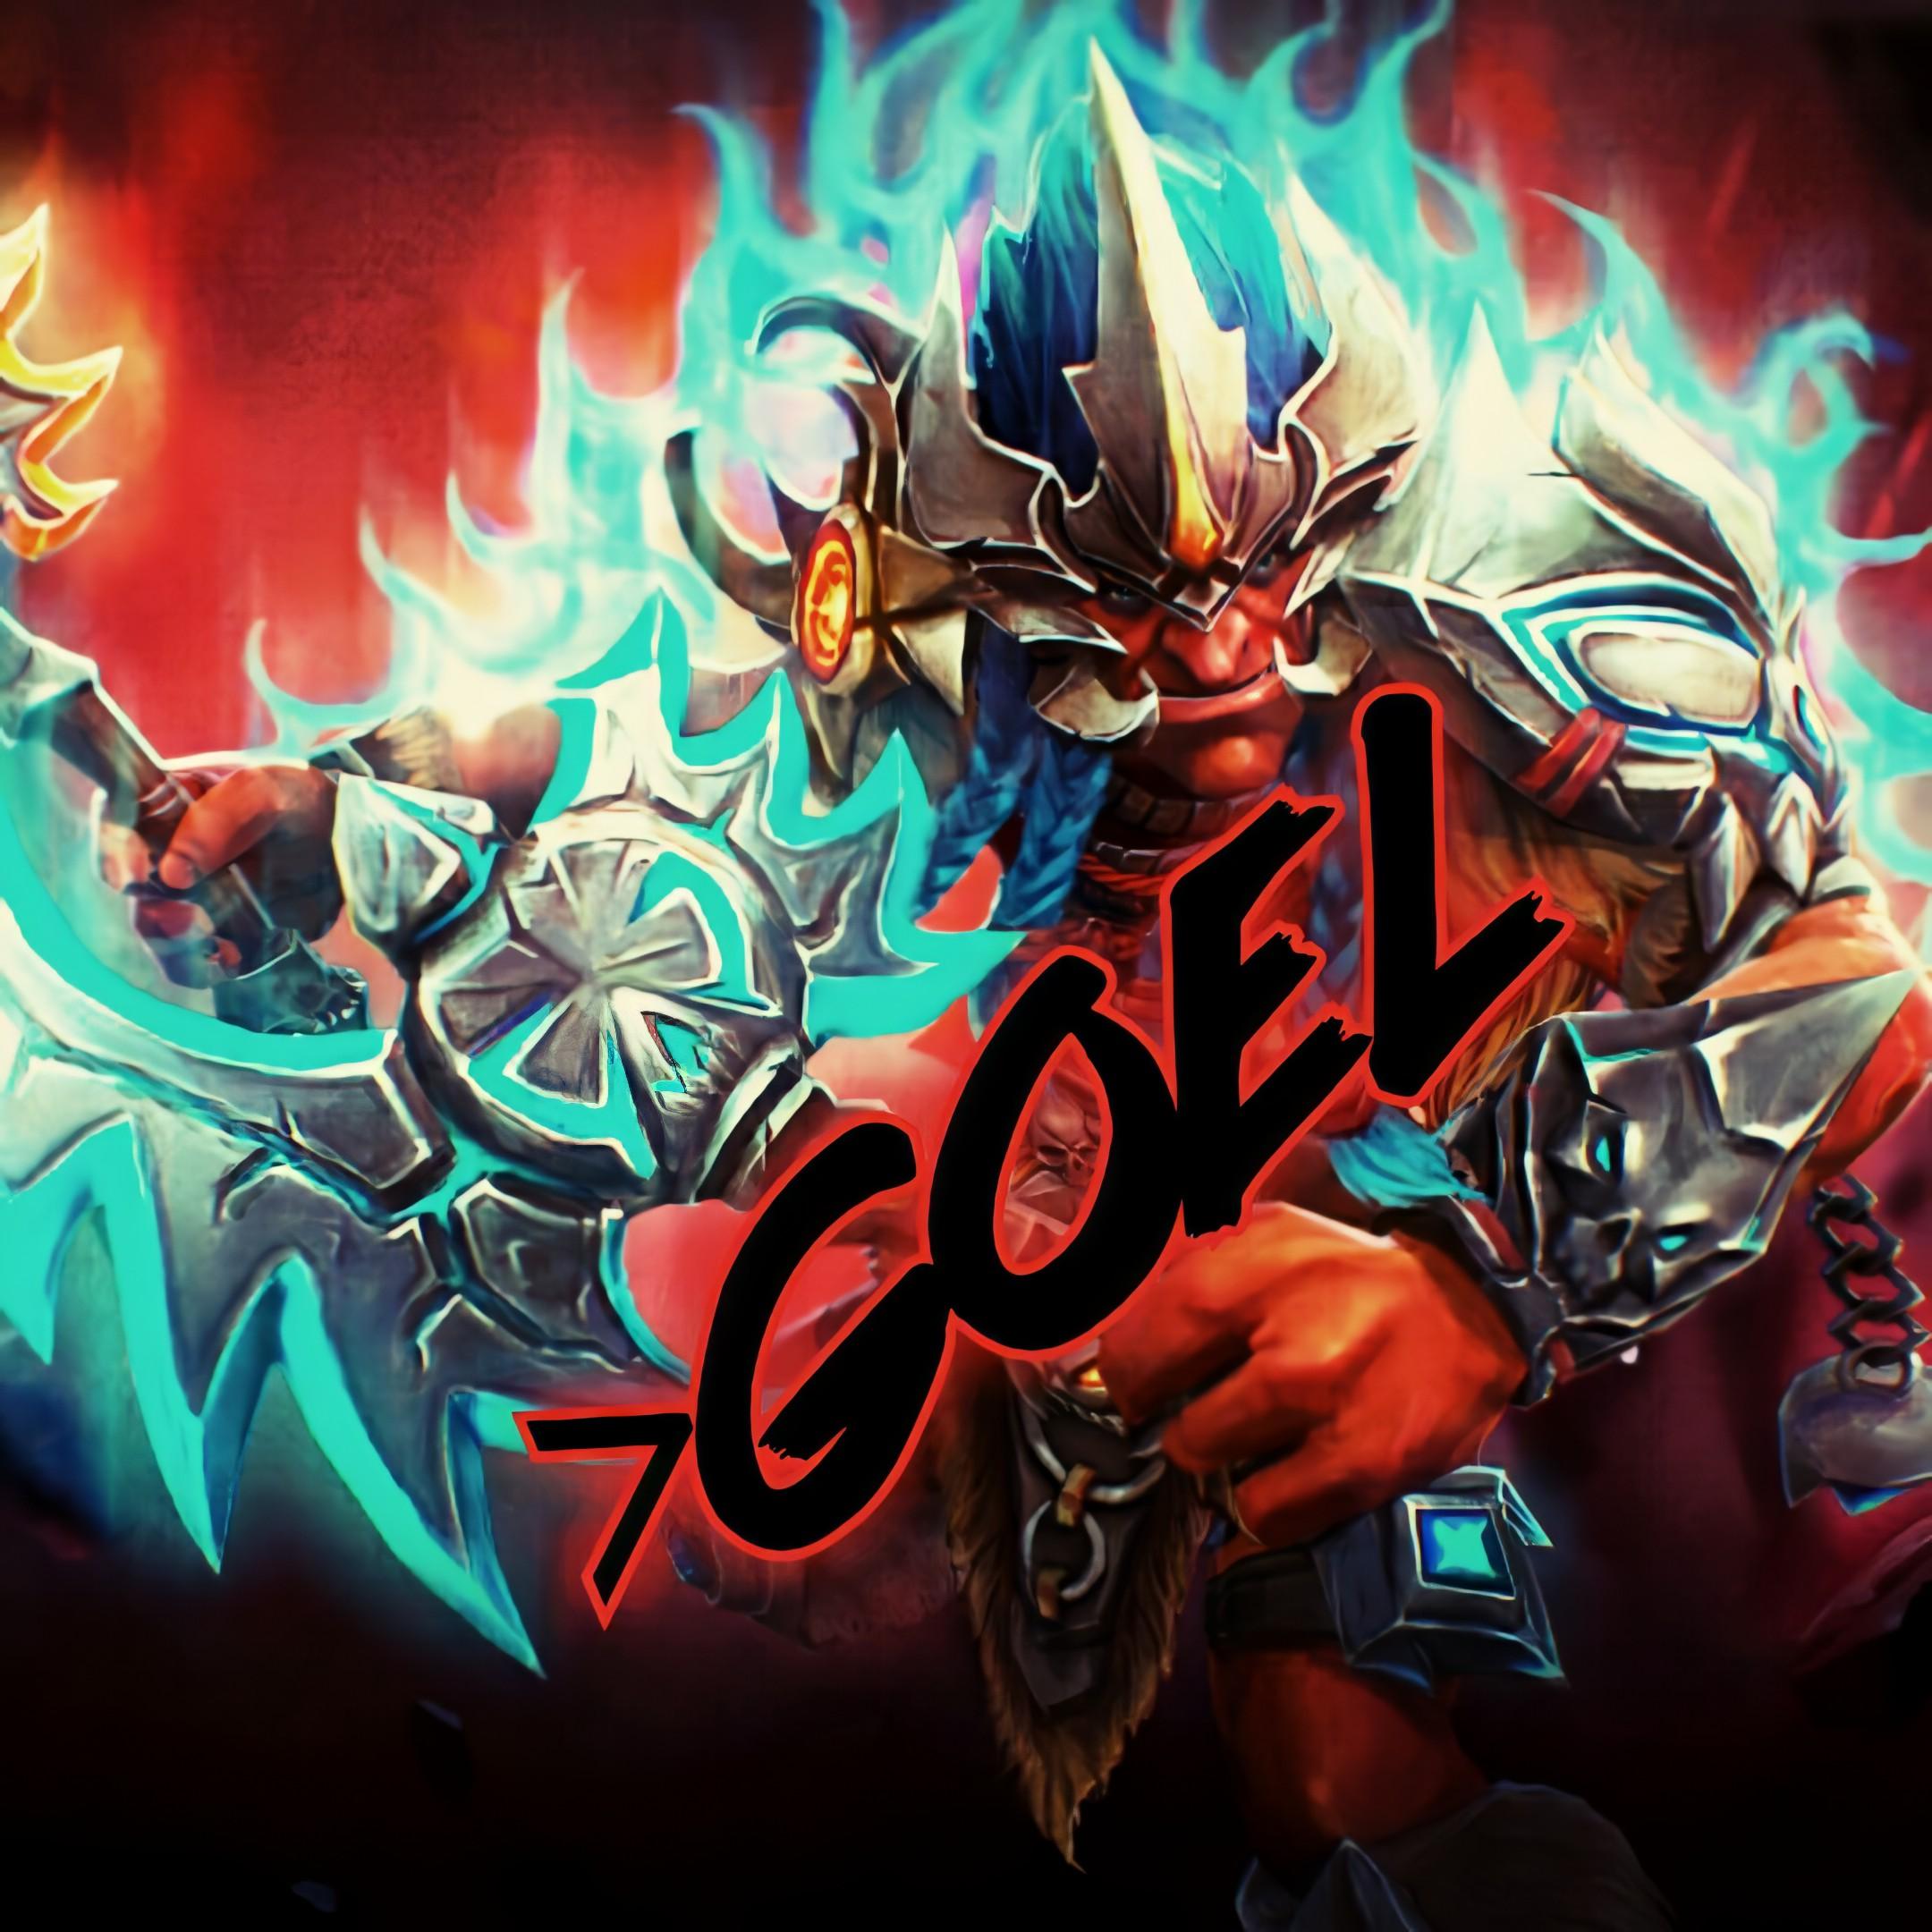 >GoeL